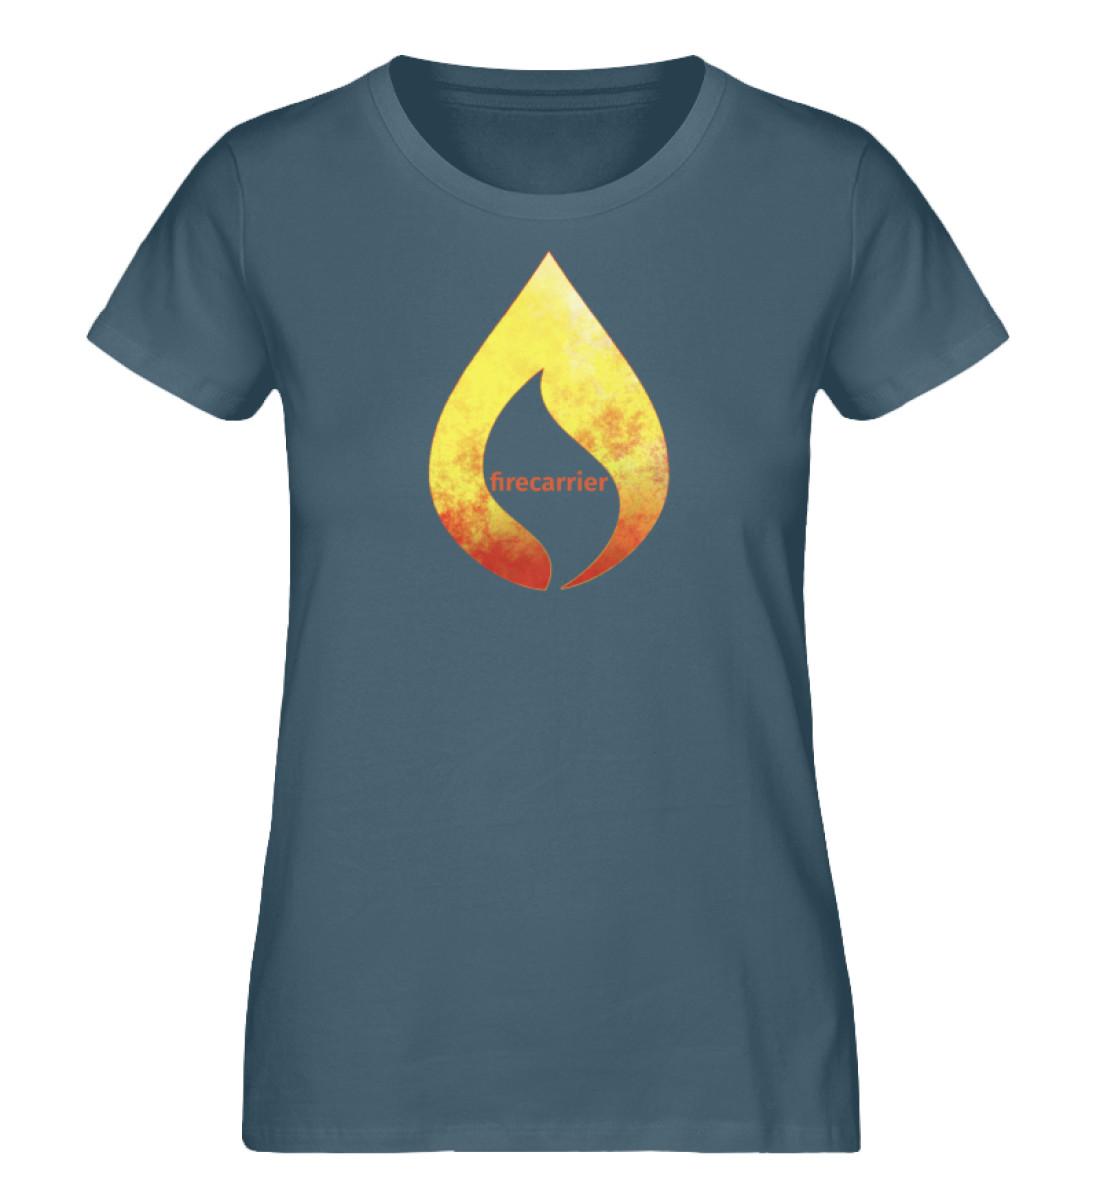 hot fire - Damen Premium Organic Shirt-6880